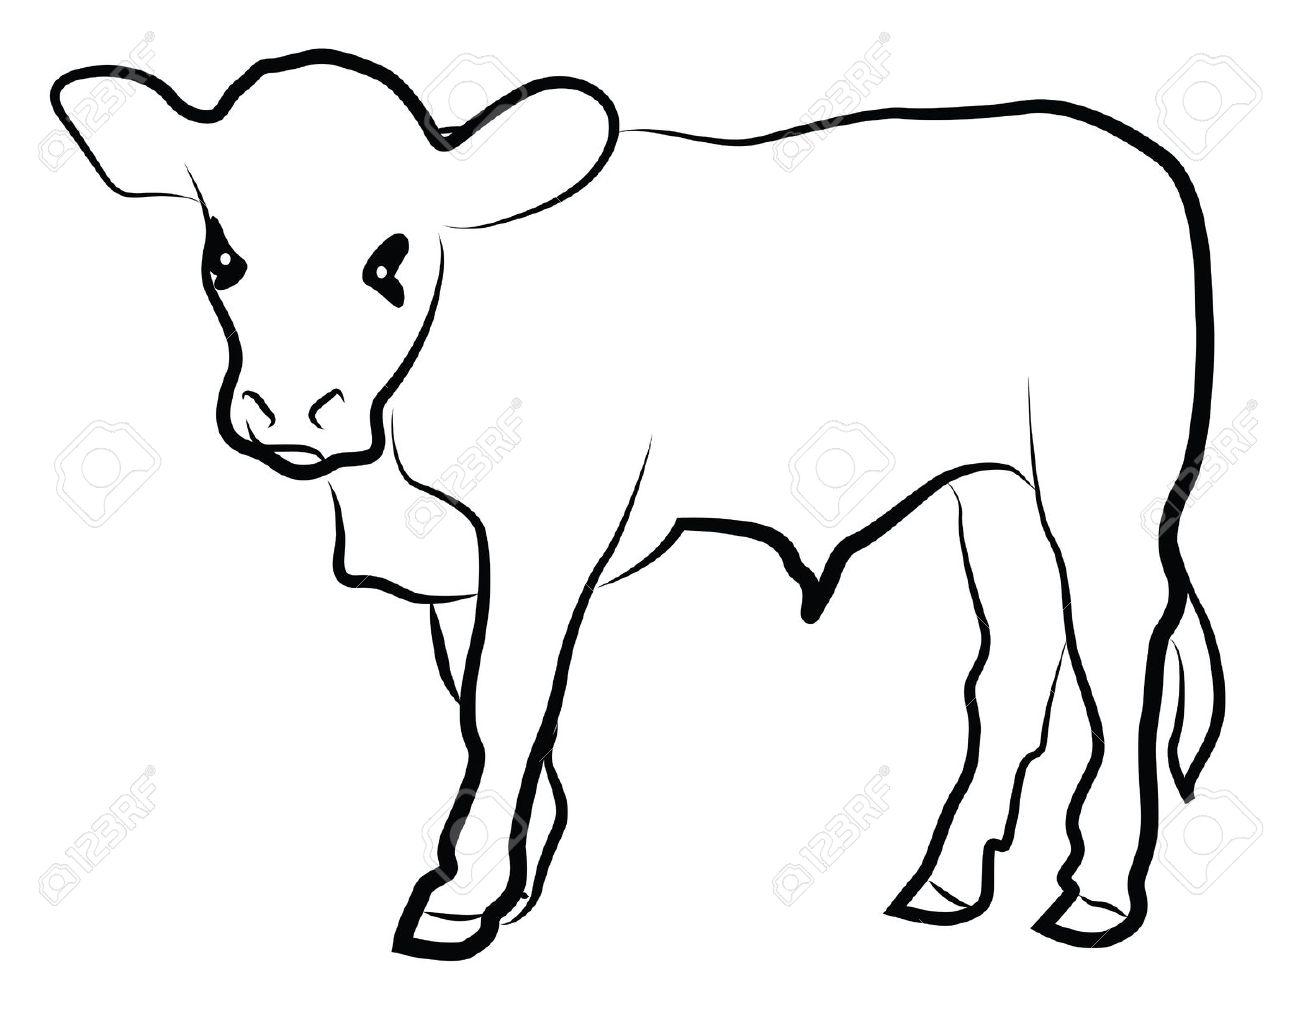 Cow Calf Silhouette At Getdrawings